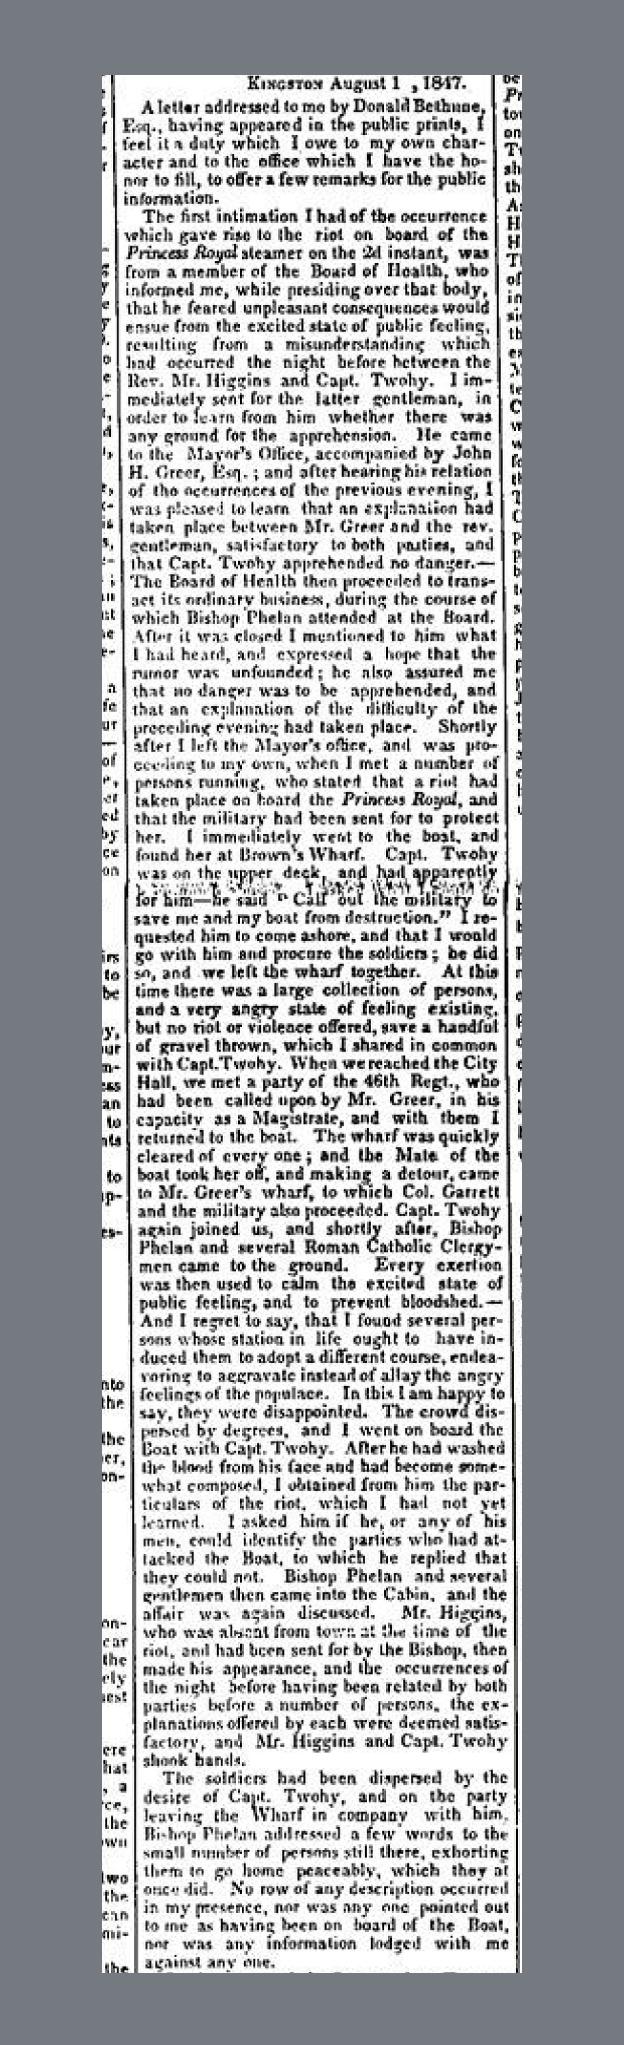 Princess Royal Riot British Whig Kingston August 18 1847